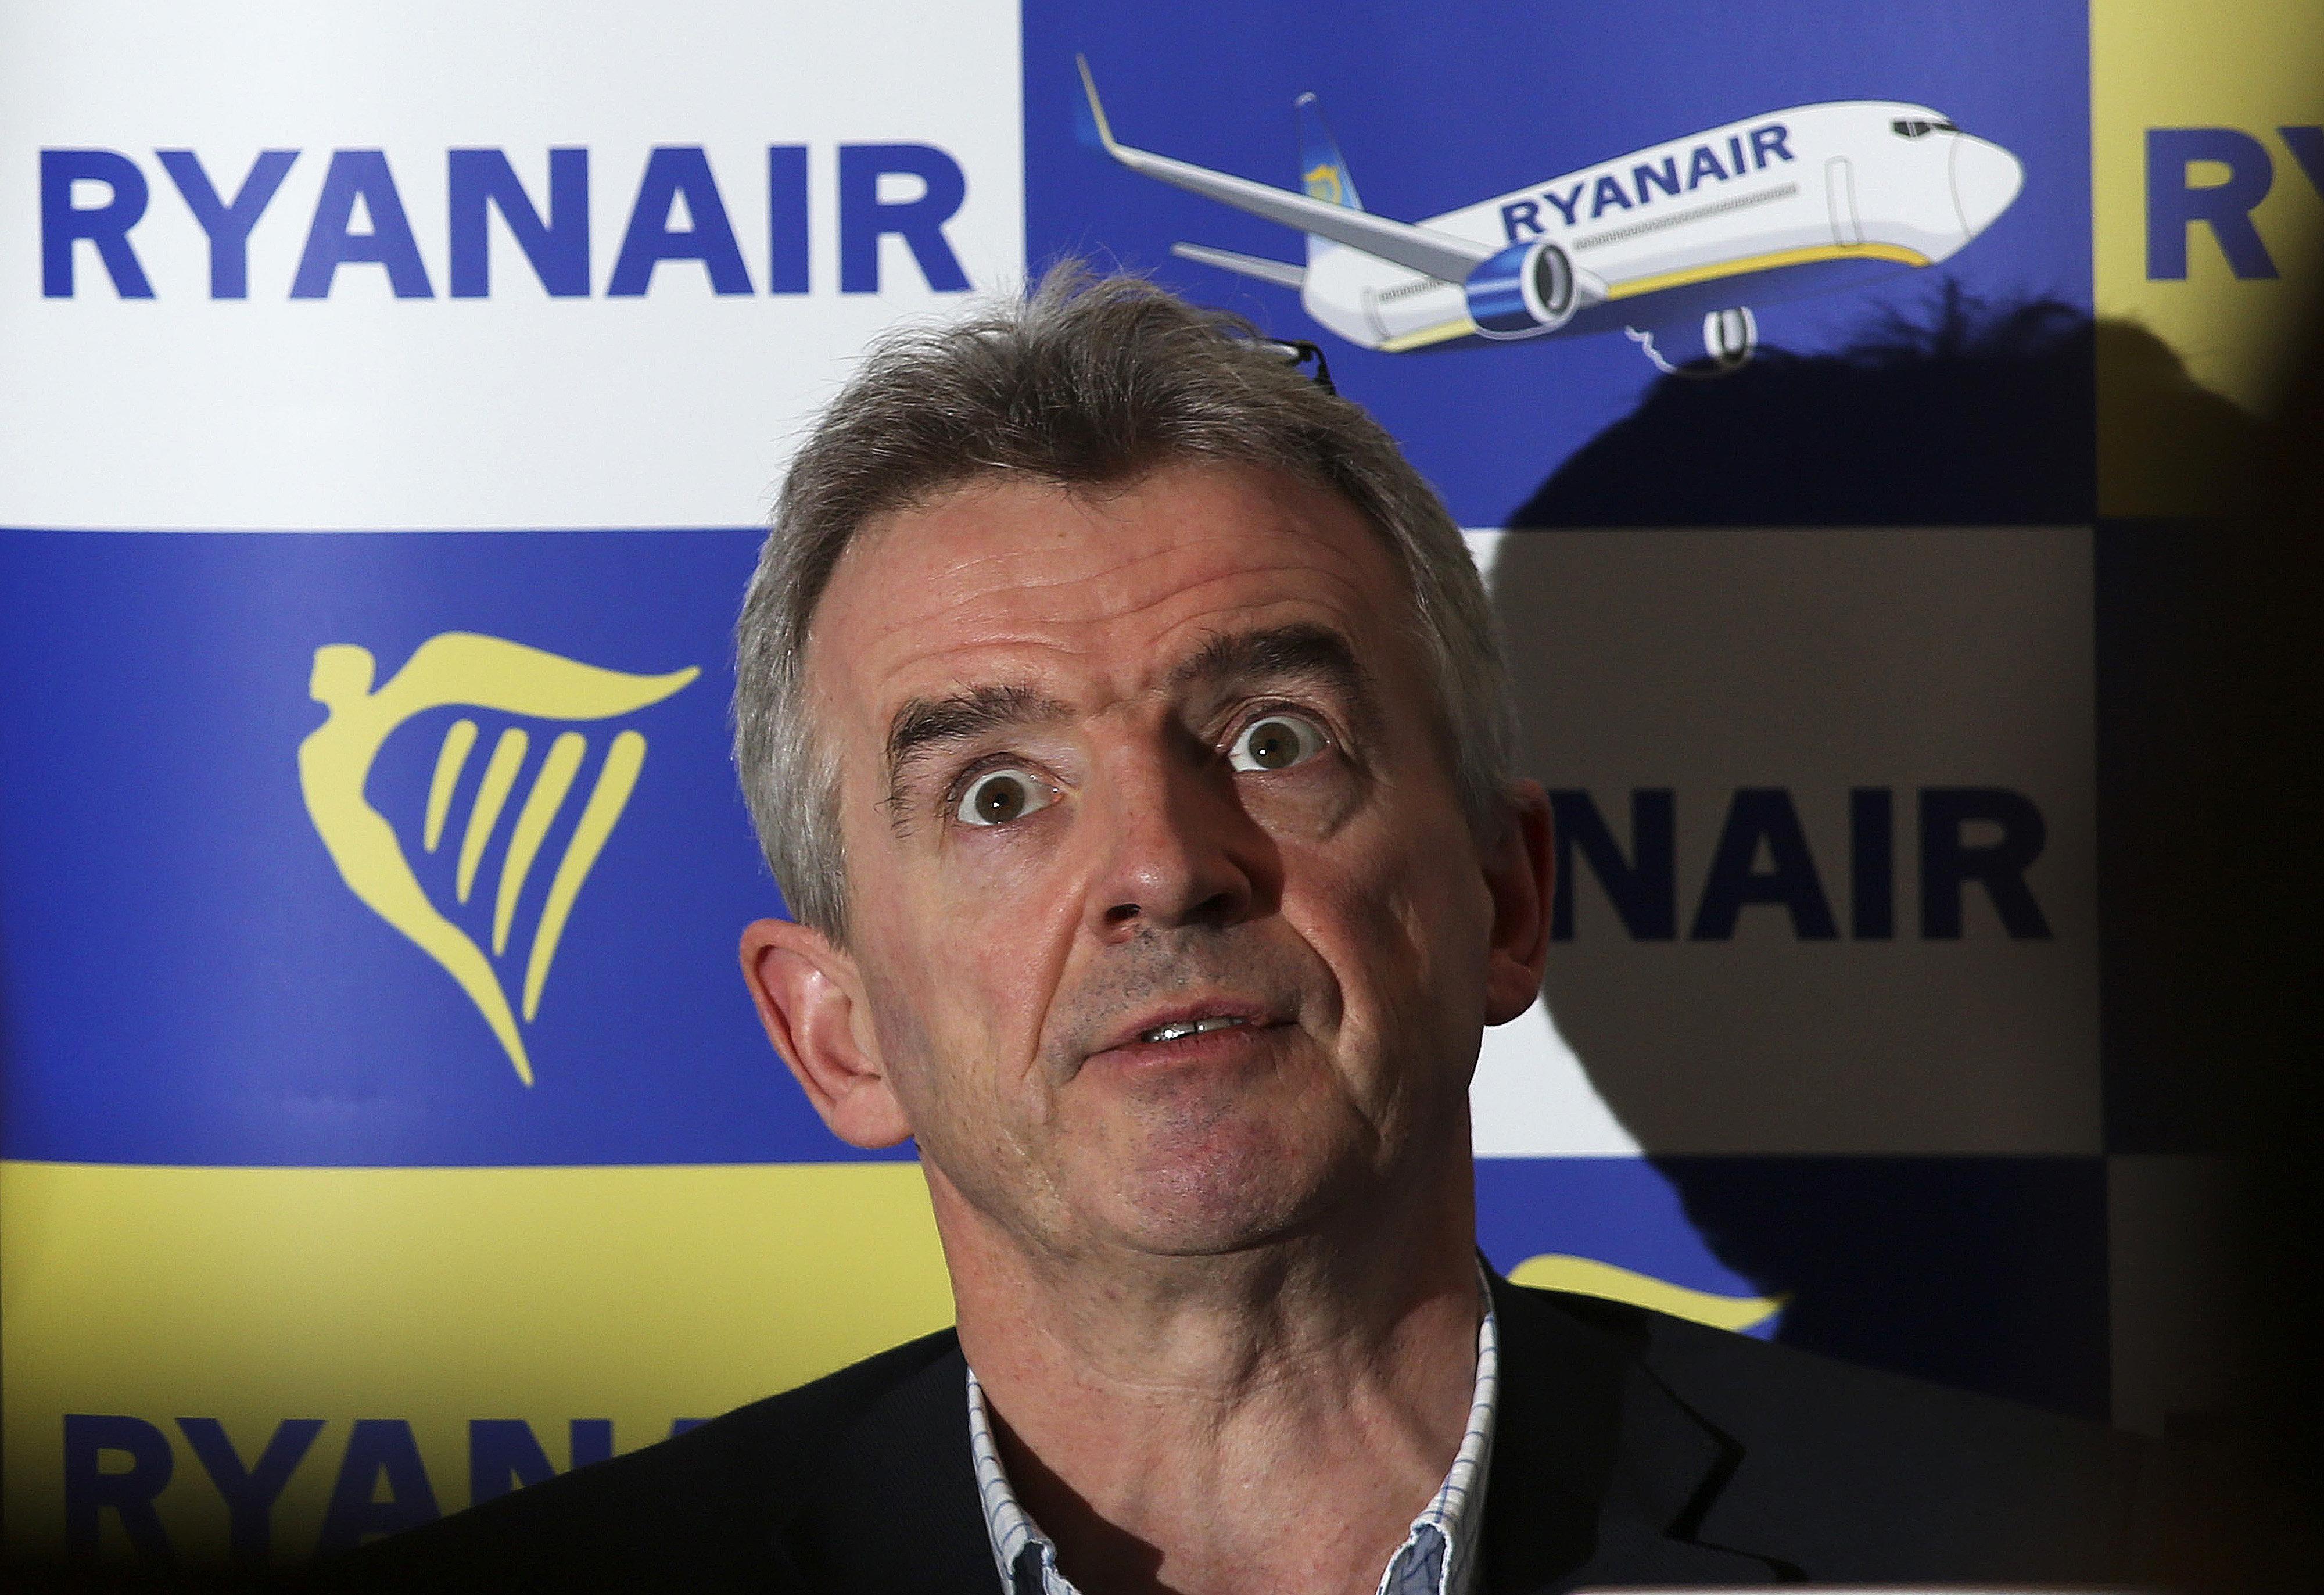 Ryanair cancels thousands more flights, 400000 passengers affected